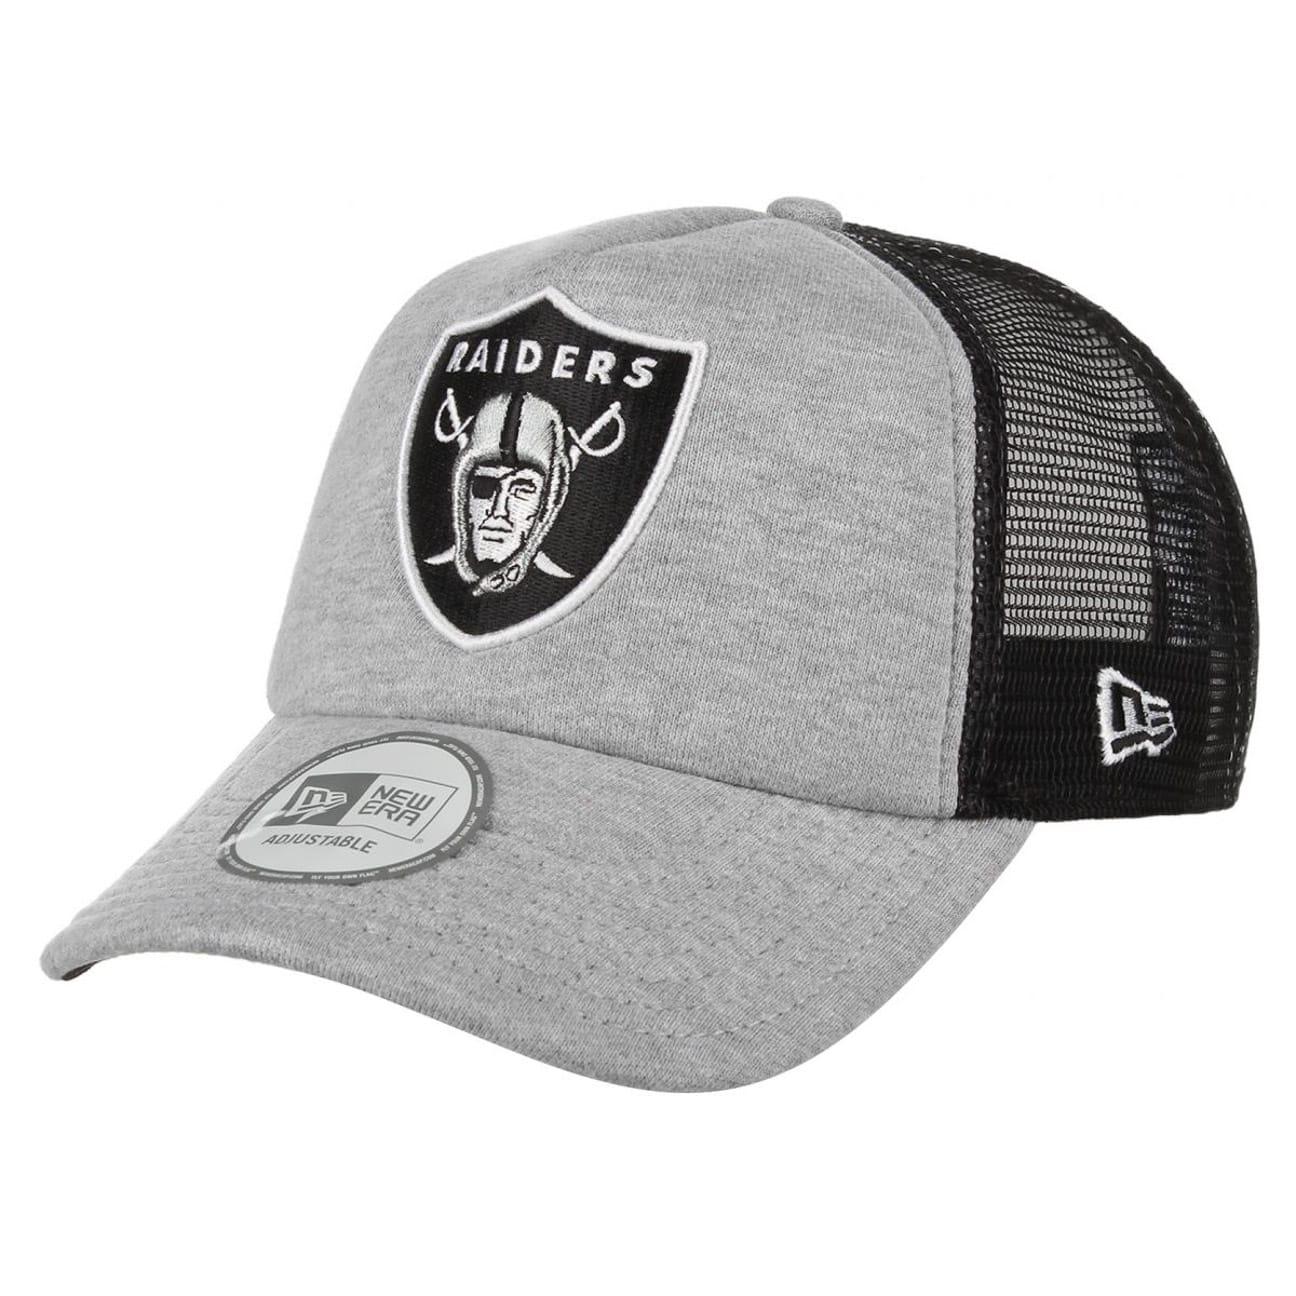 8ac278f4b2abc Oakland Raiders Trucker Cap by New Era - black 1